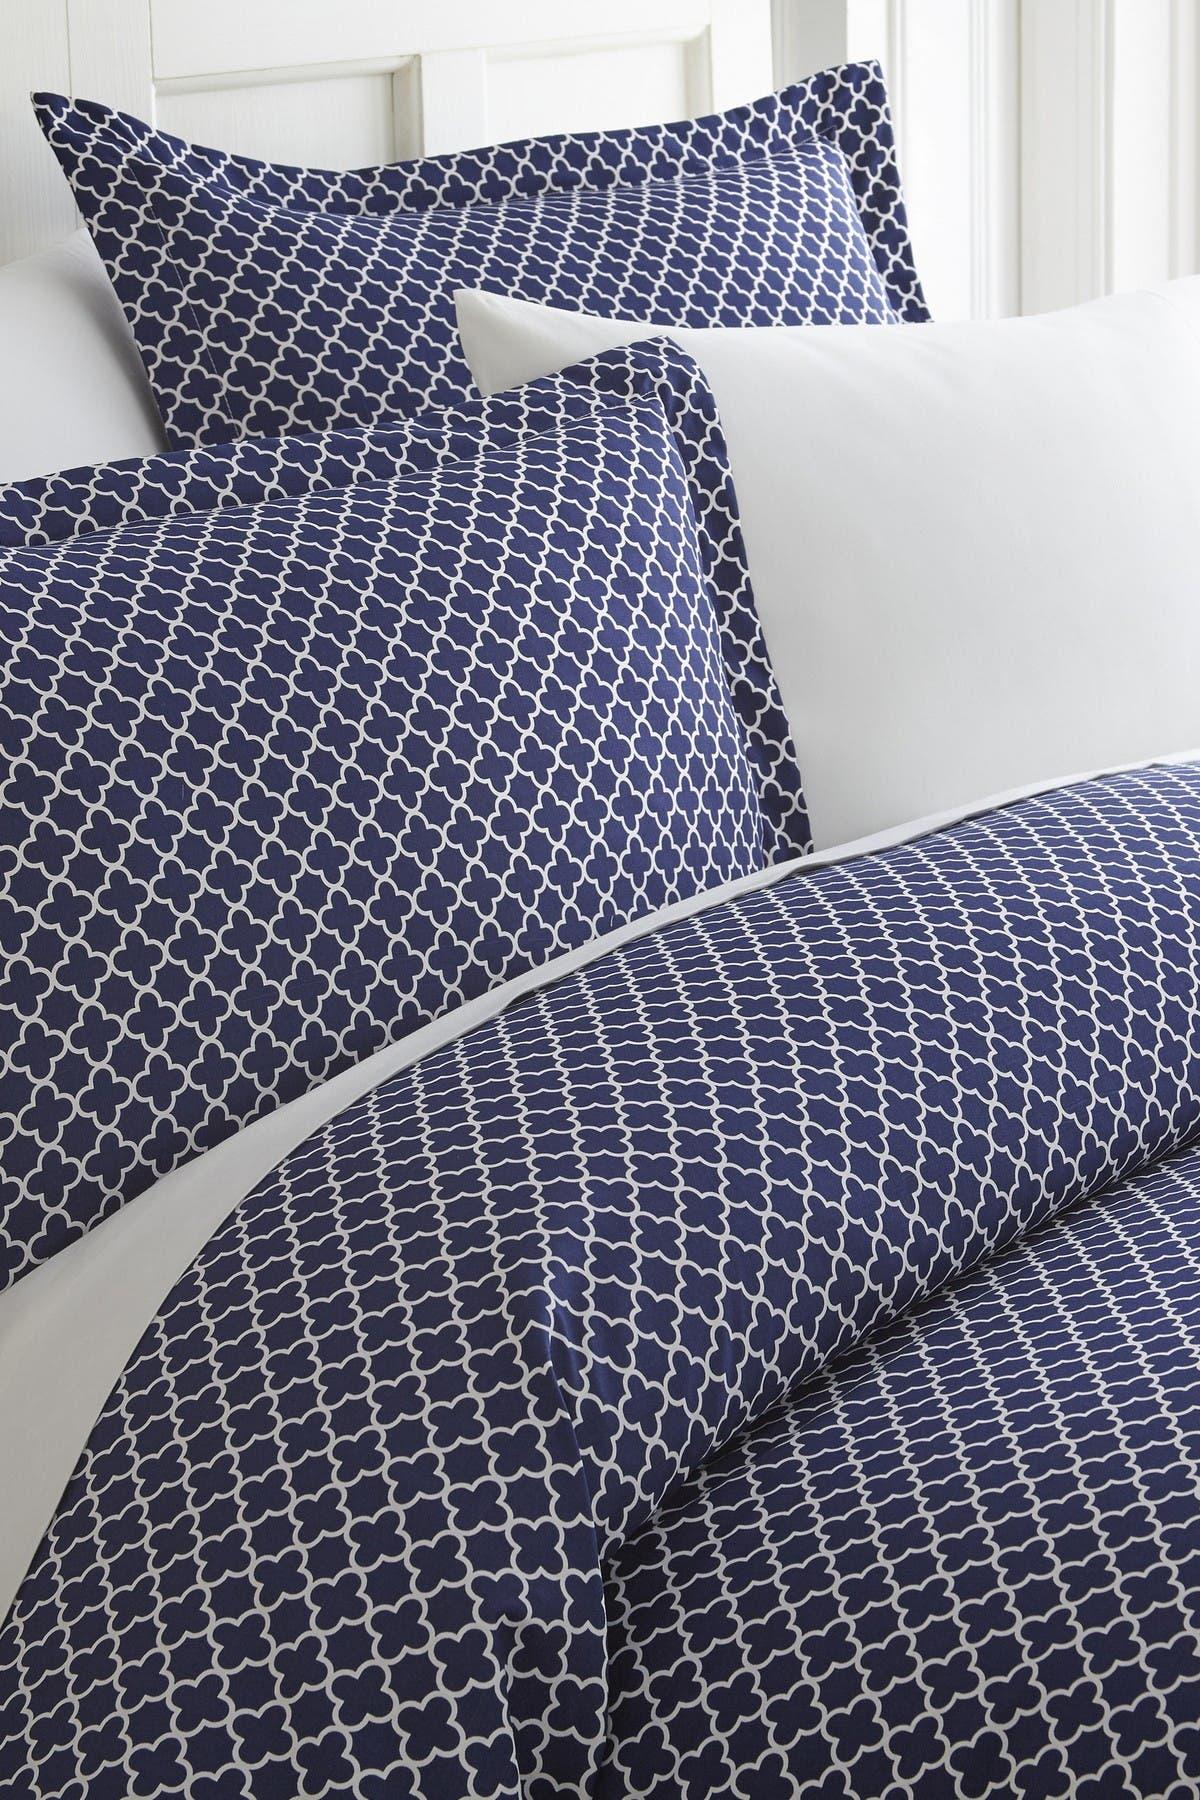 Ienjoy Home Home Spun Premium Ultra Soft Quadrafoil Pattern 3-piece Duvet Cover King Set In Navy